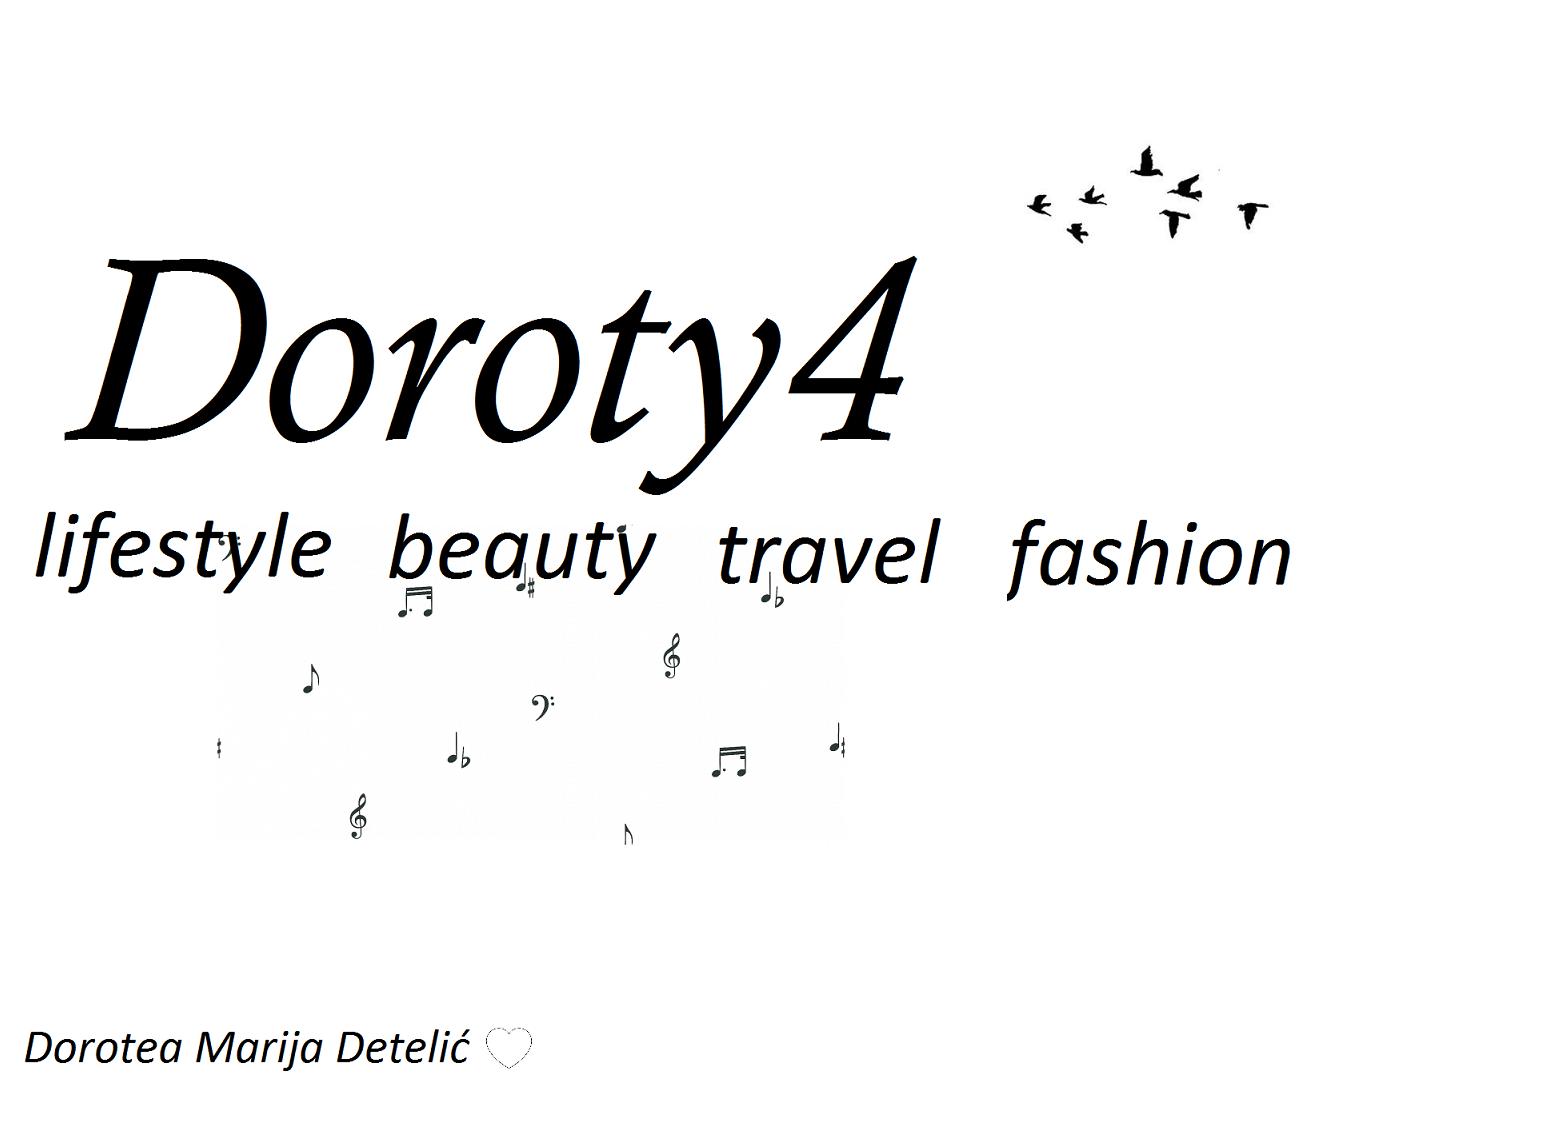 doroty4